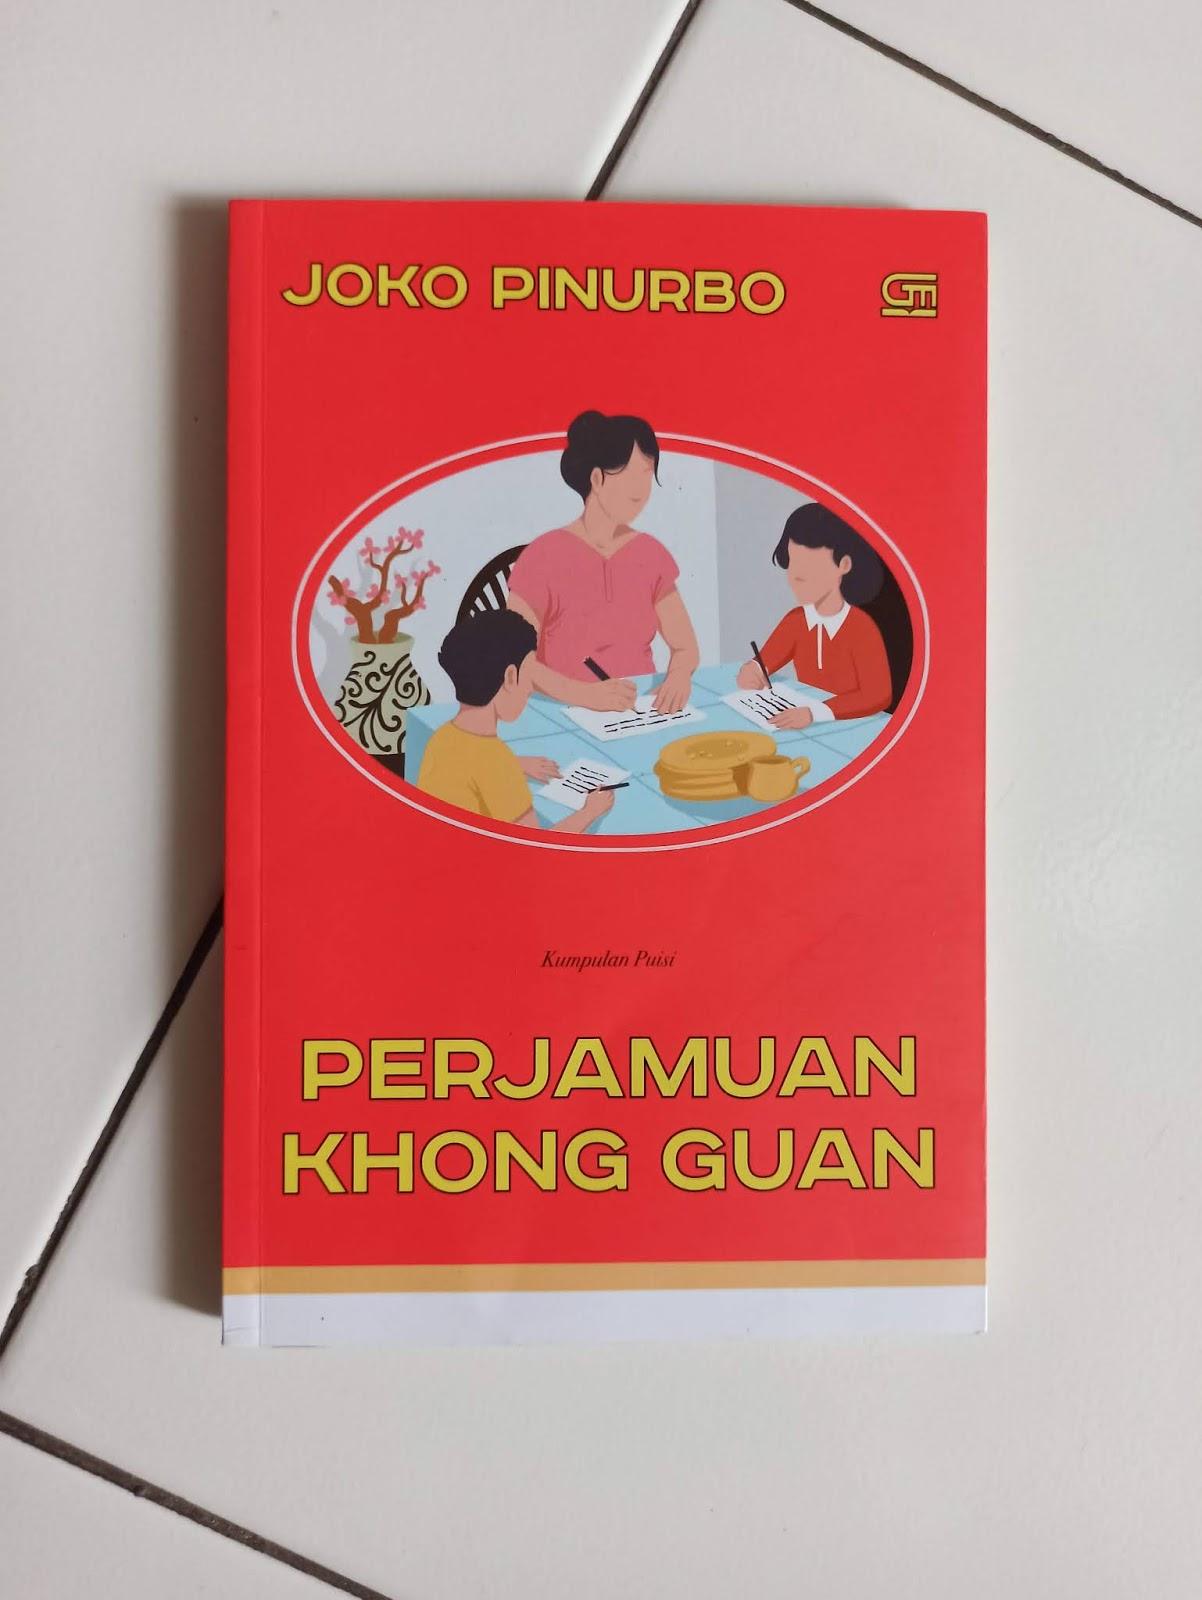 Kumpulan Puisi by Joko Pinurbo